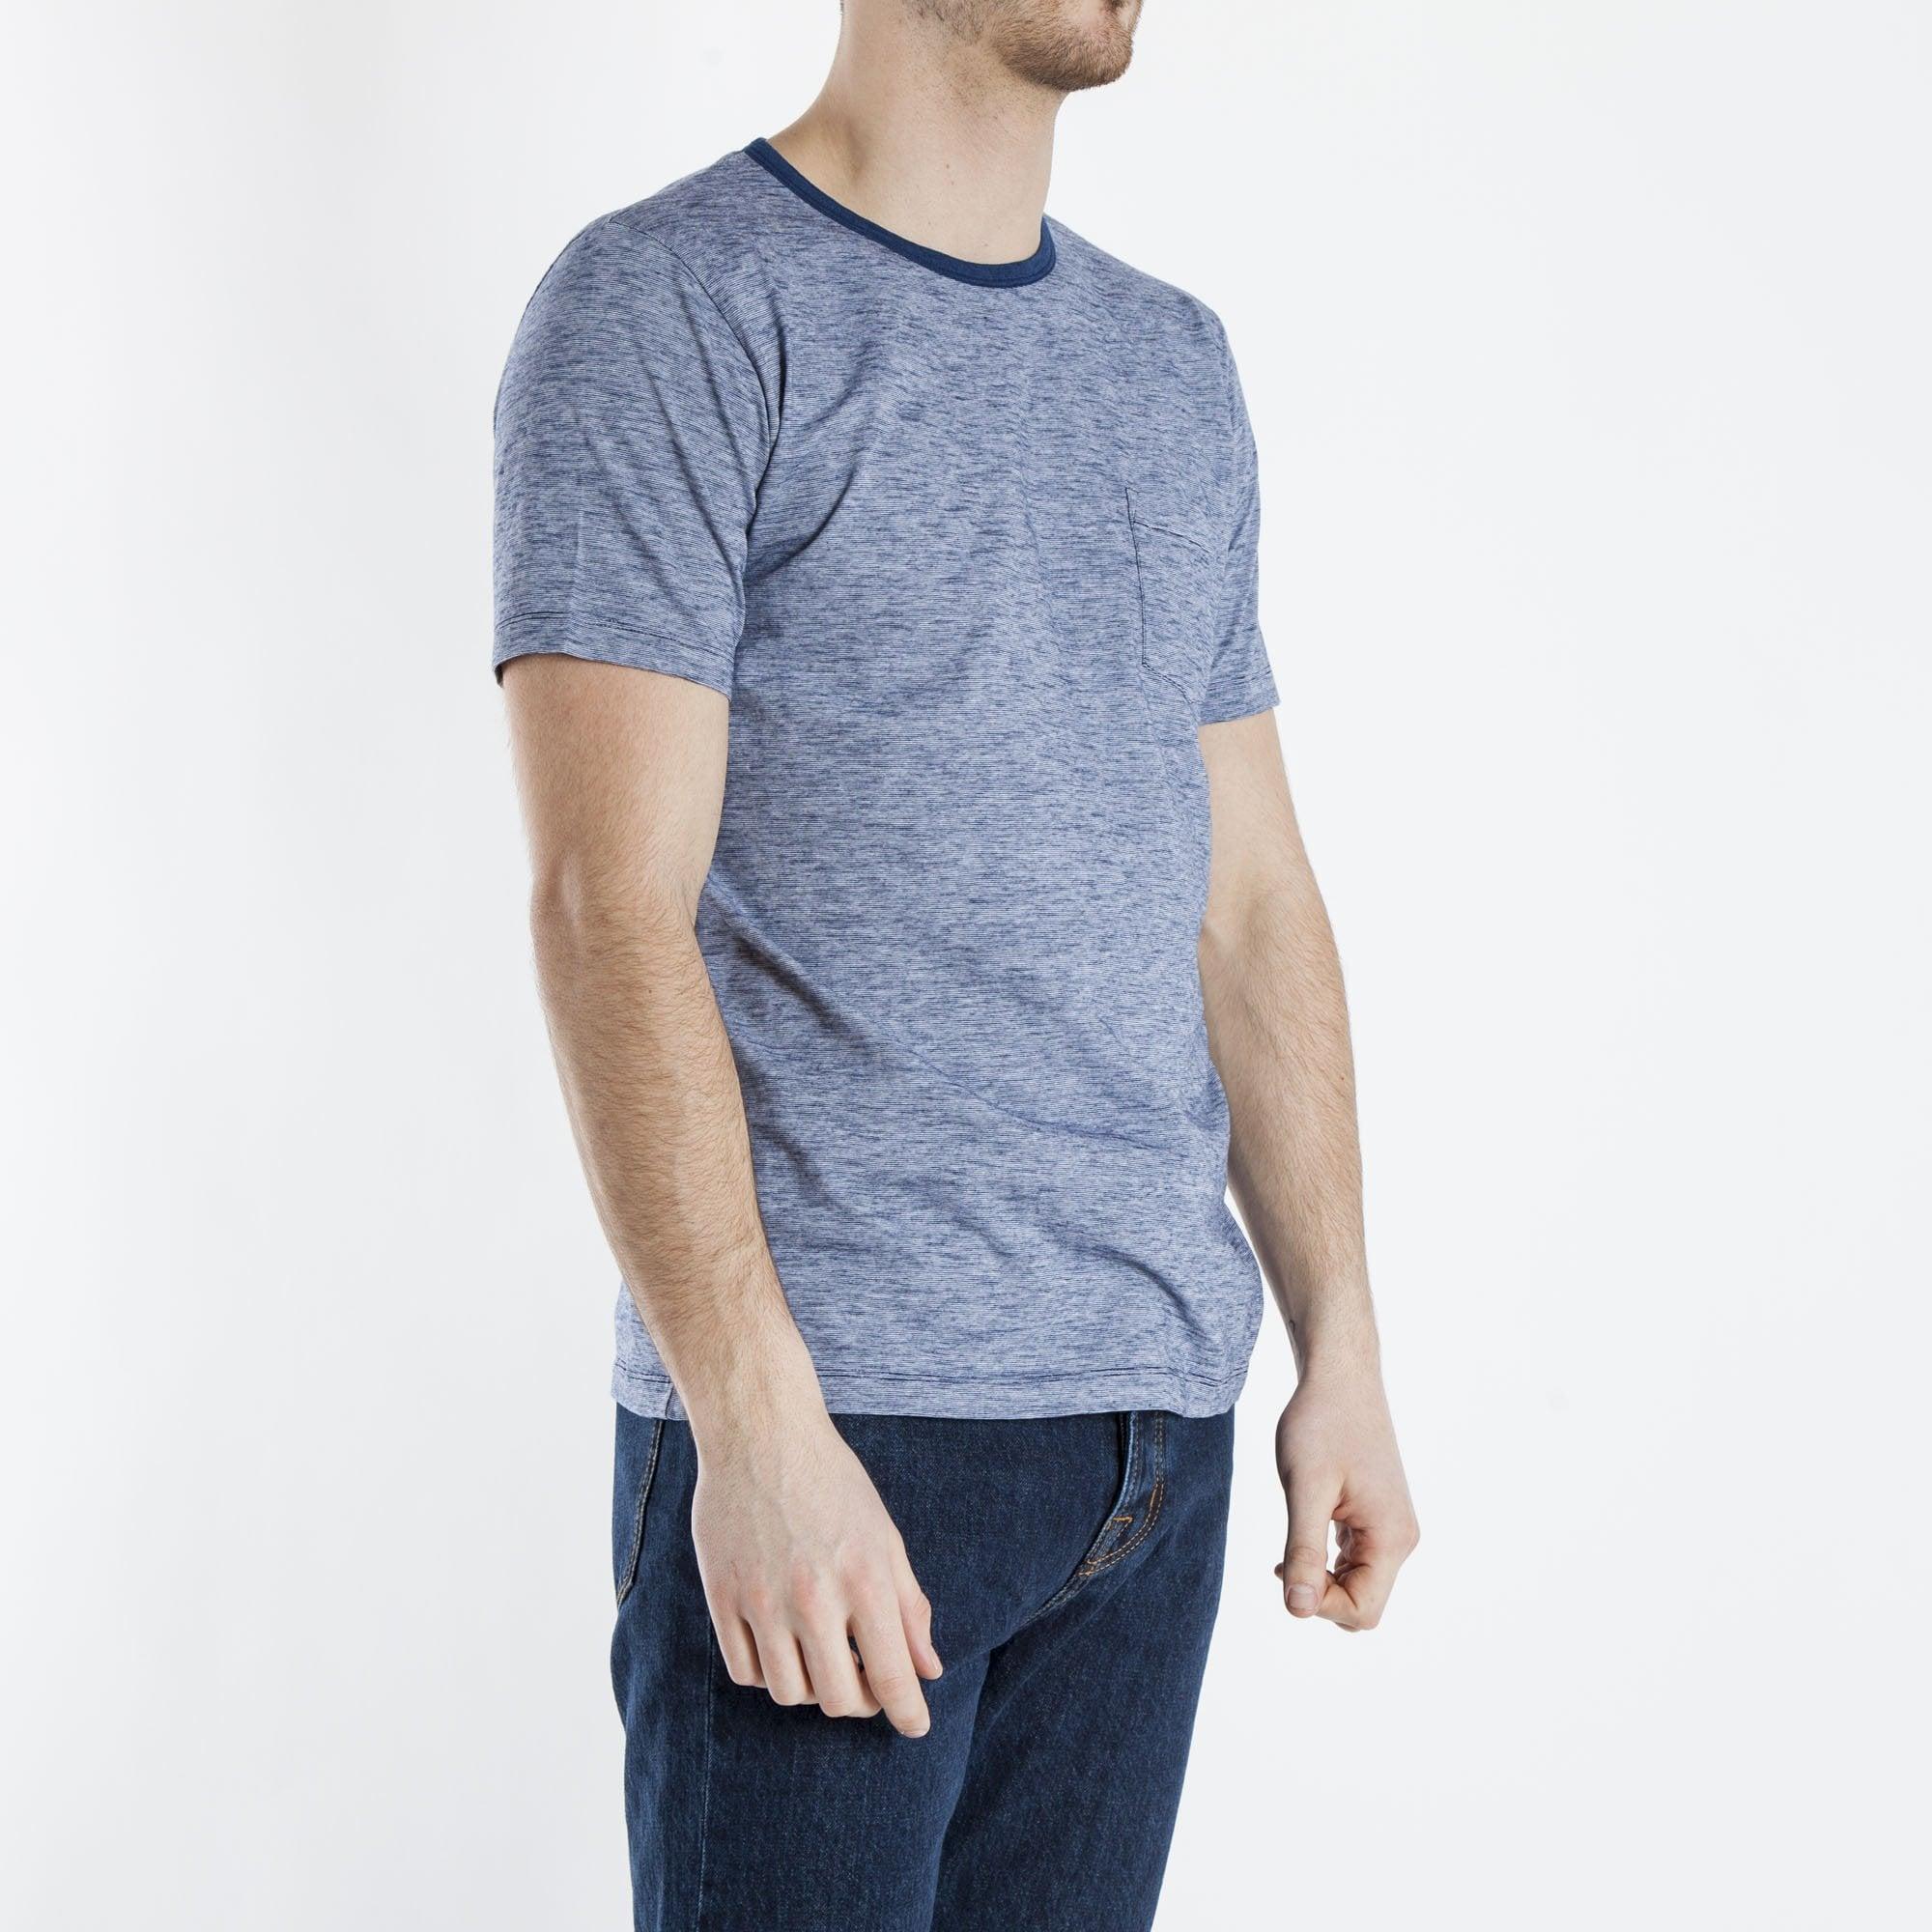 a315b38bc Pocket Crew Stripe T Shirt in Indigo